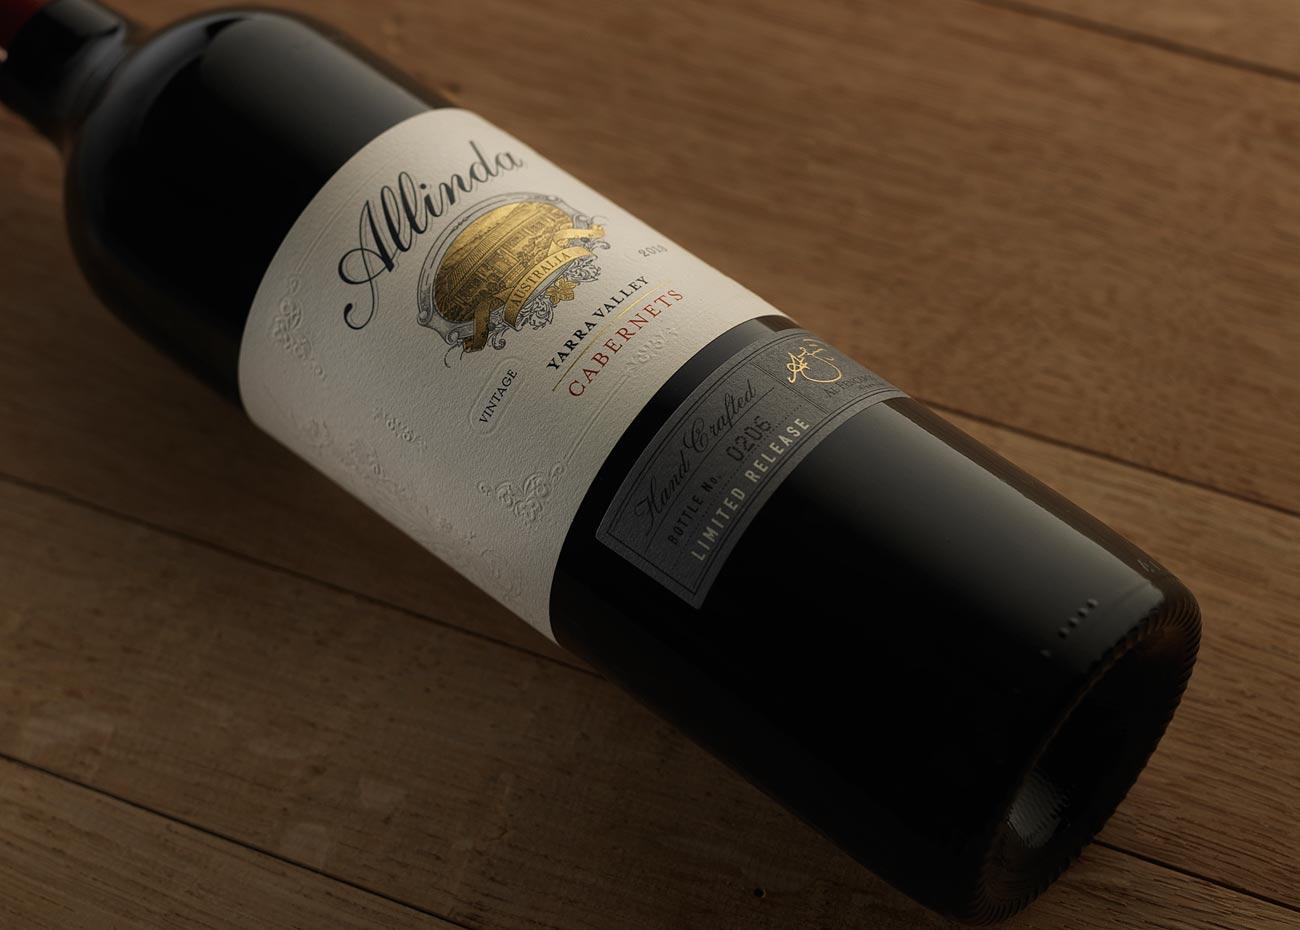 product-wine-bottle-photography-1.jpg